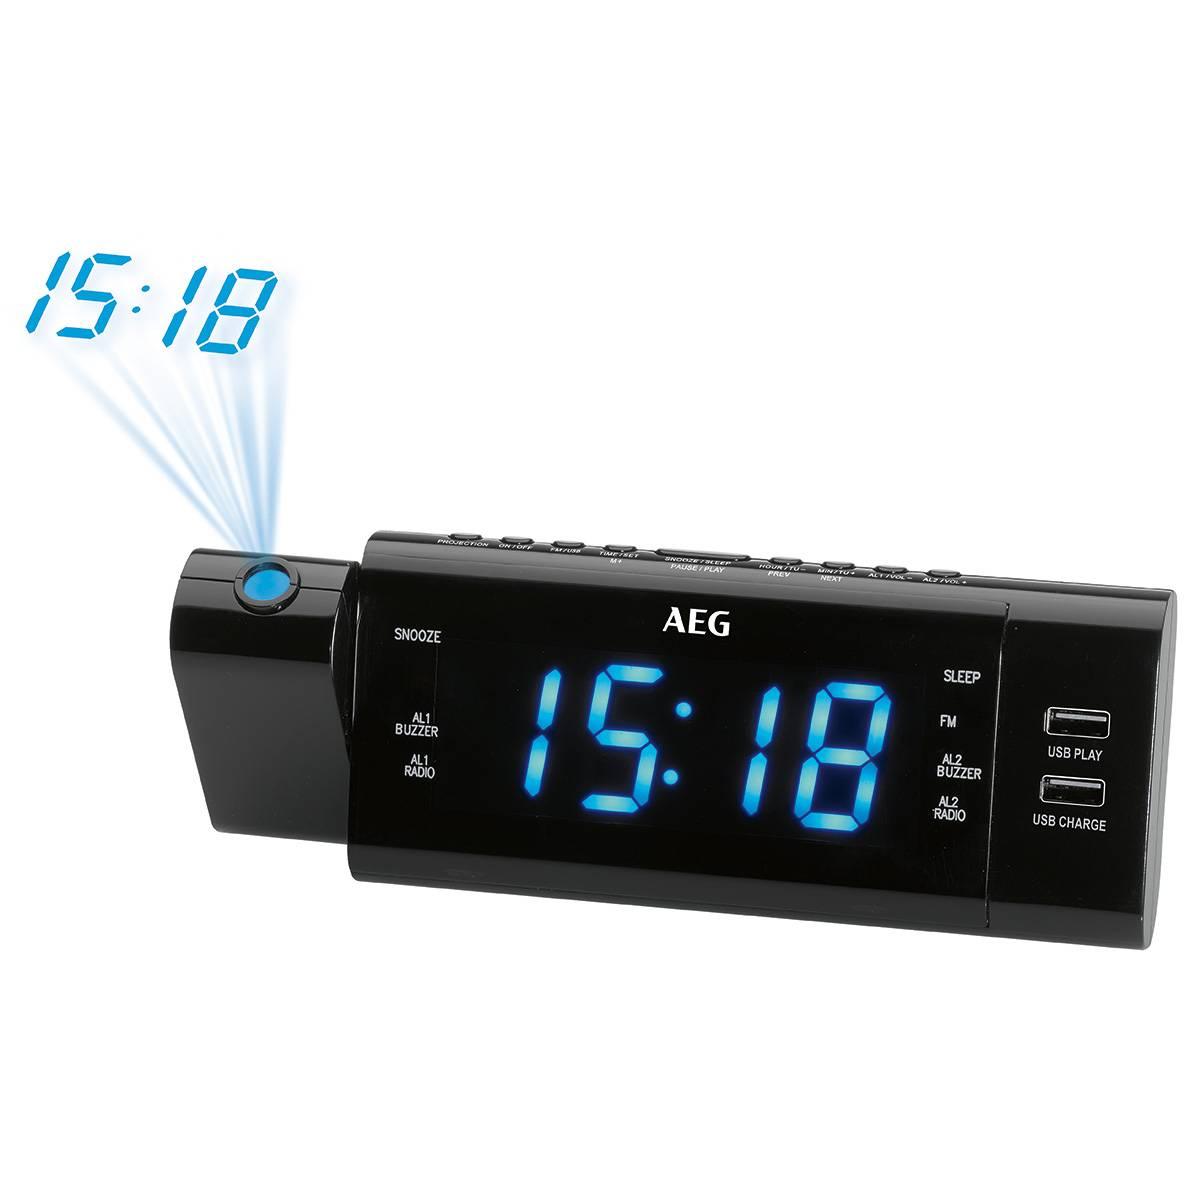 016341a1efae AEG MRC 4159 - Radio reloj despertador proyector digital 2xUSB gran pantalla  2 alarmas